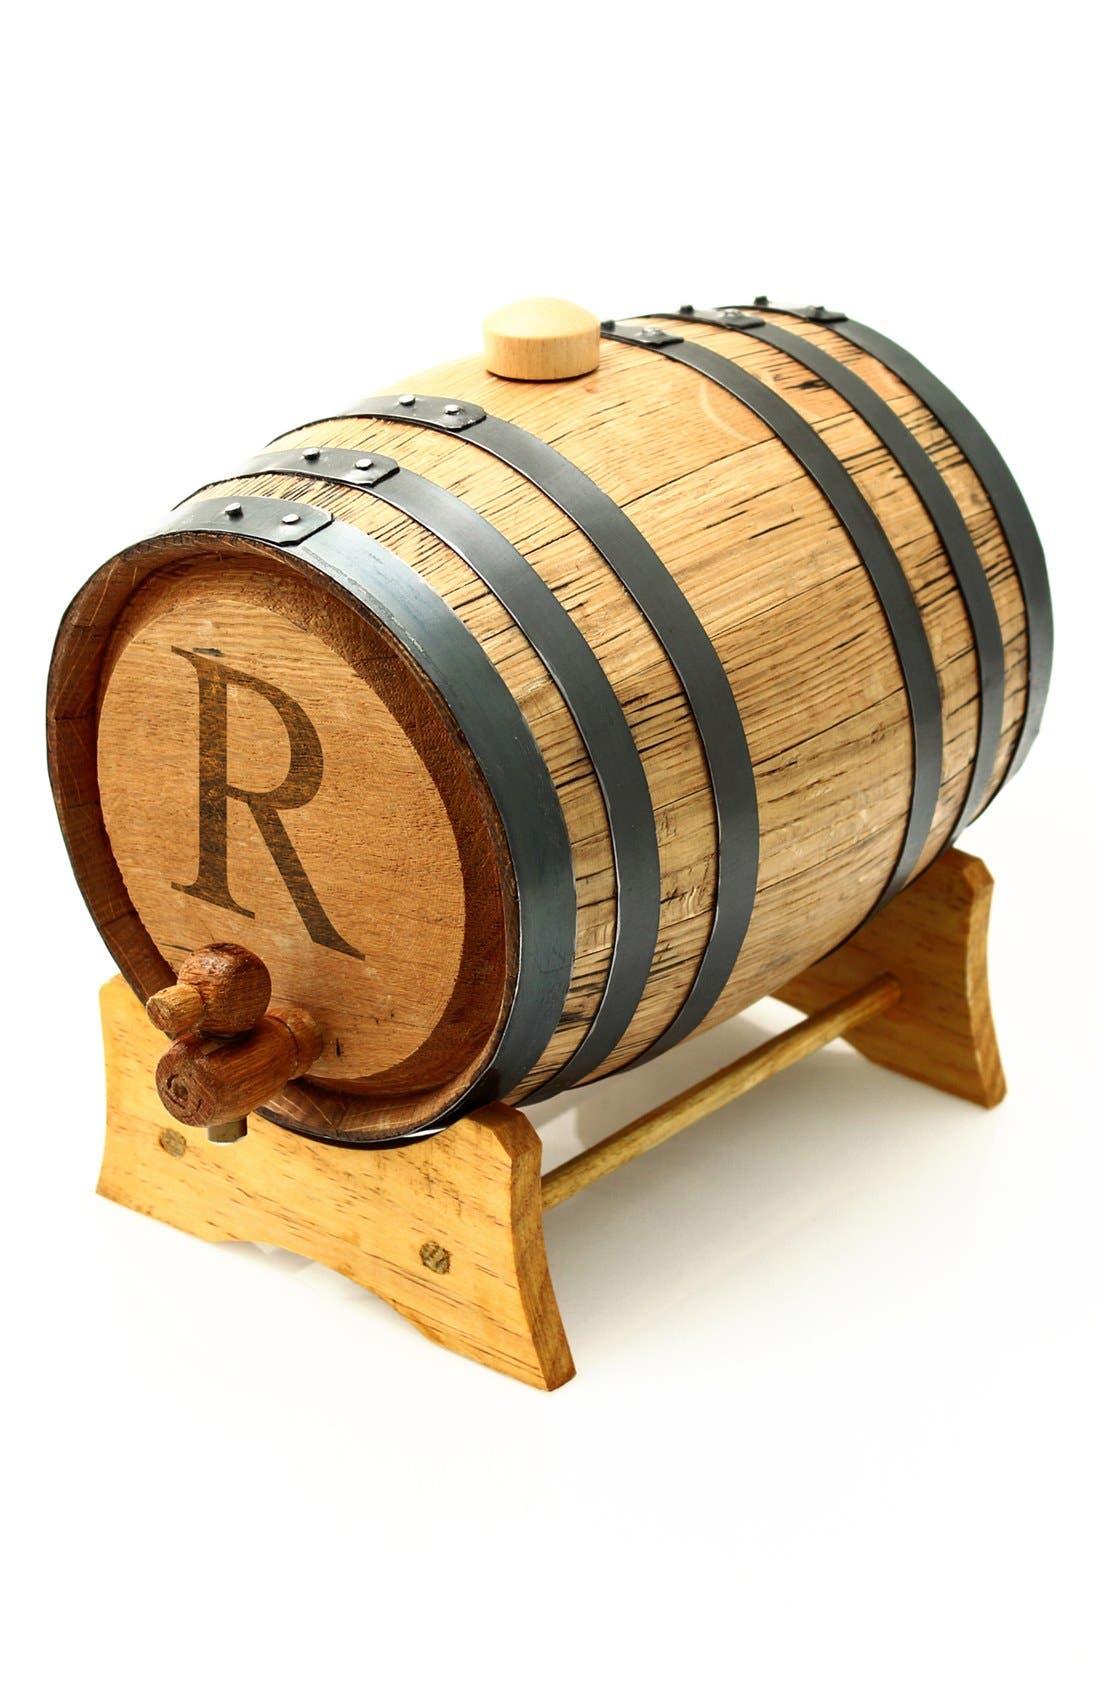 Alternate Image 1 Selected - Cathy's Concepts Monogram Oak Whiskey Barrel, Large